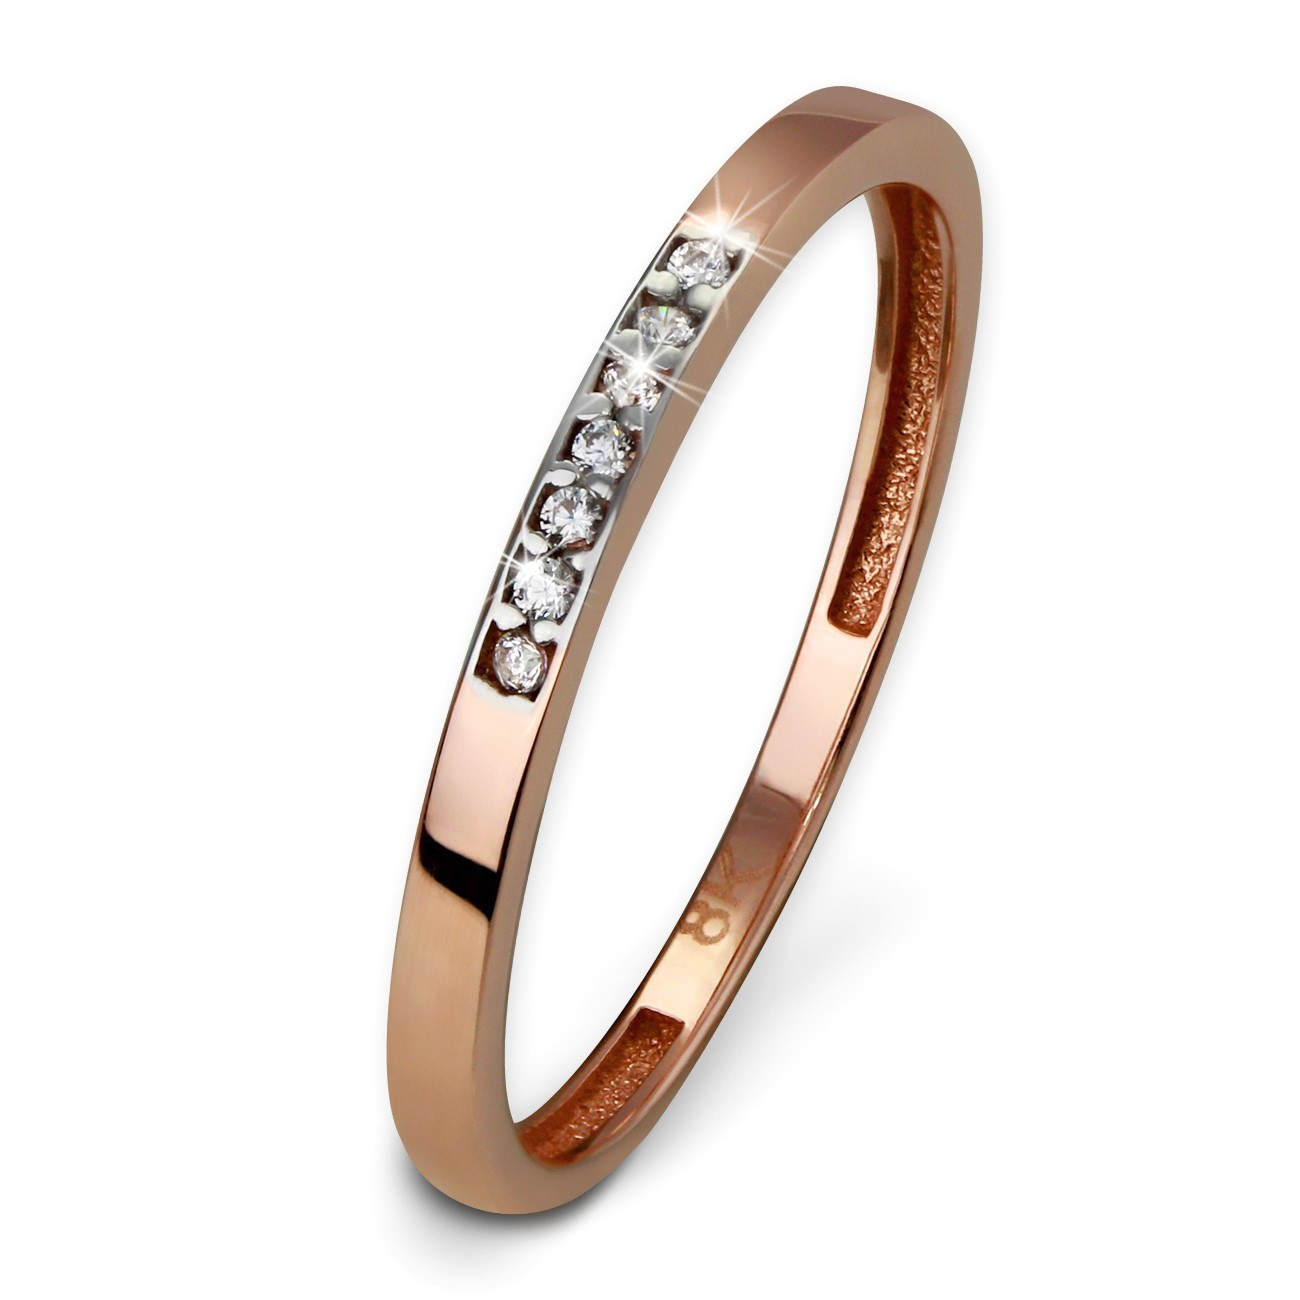 SilberDream Gold Ring Zirkonia weiß Gr.56 333er Rosegold GDR502E56